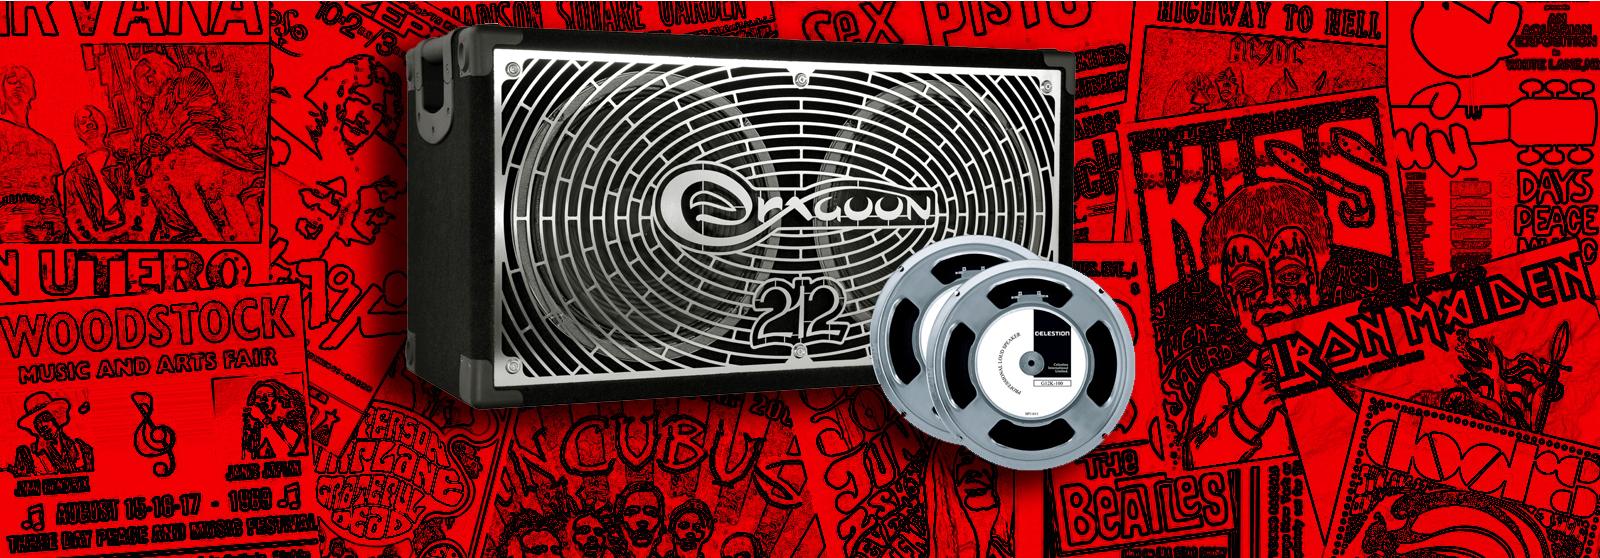 Dragoon - The Custom Speaker - DRAGOON-2100C8K_20160629200228757540.jpg